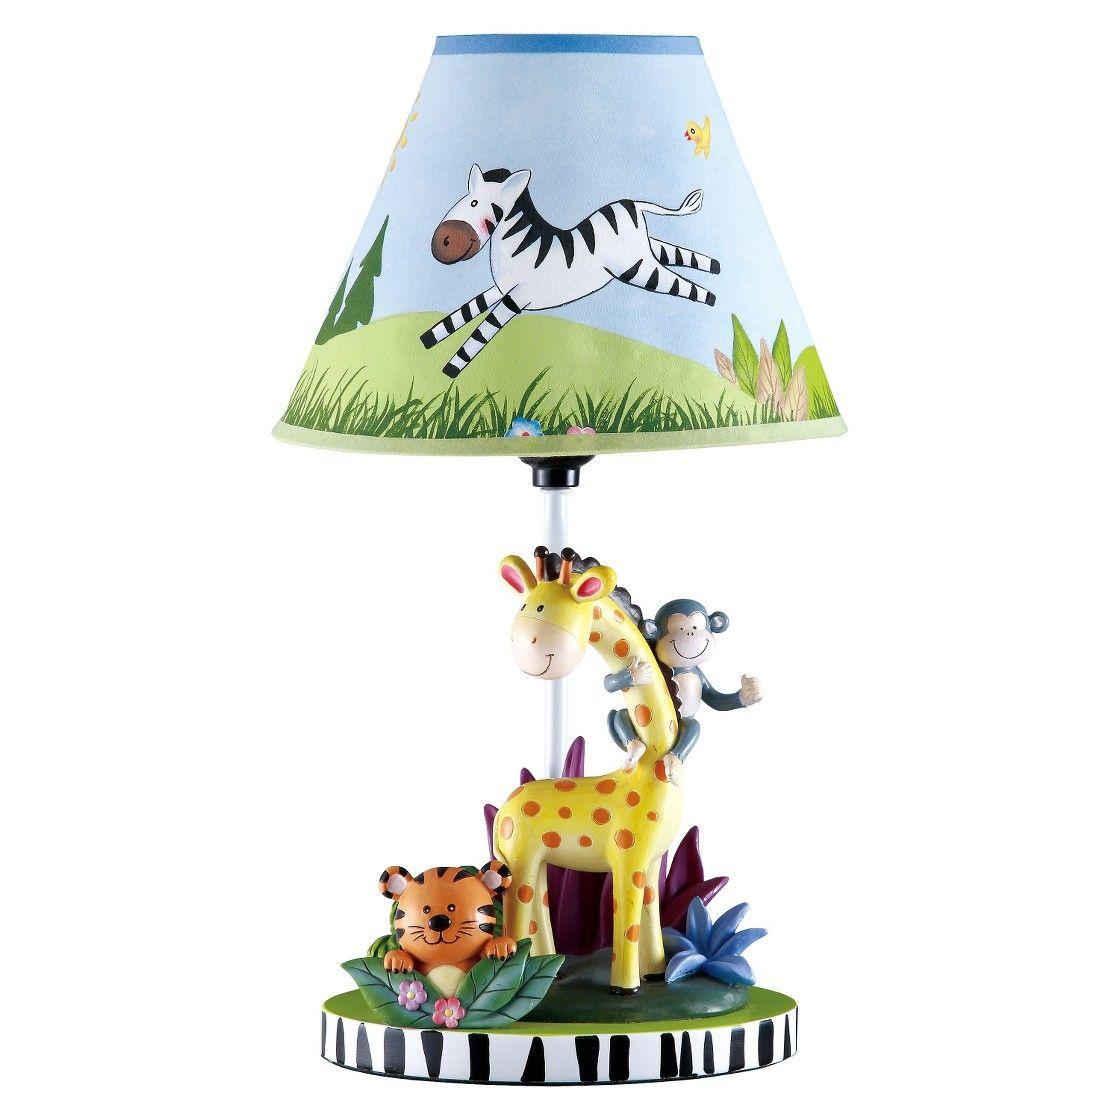 Target online teamson kids table lamp sunny safari kids target online teamson kids table lamp sunny safari aloadofball Image collections